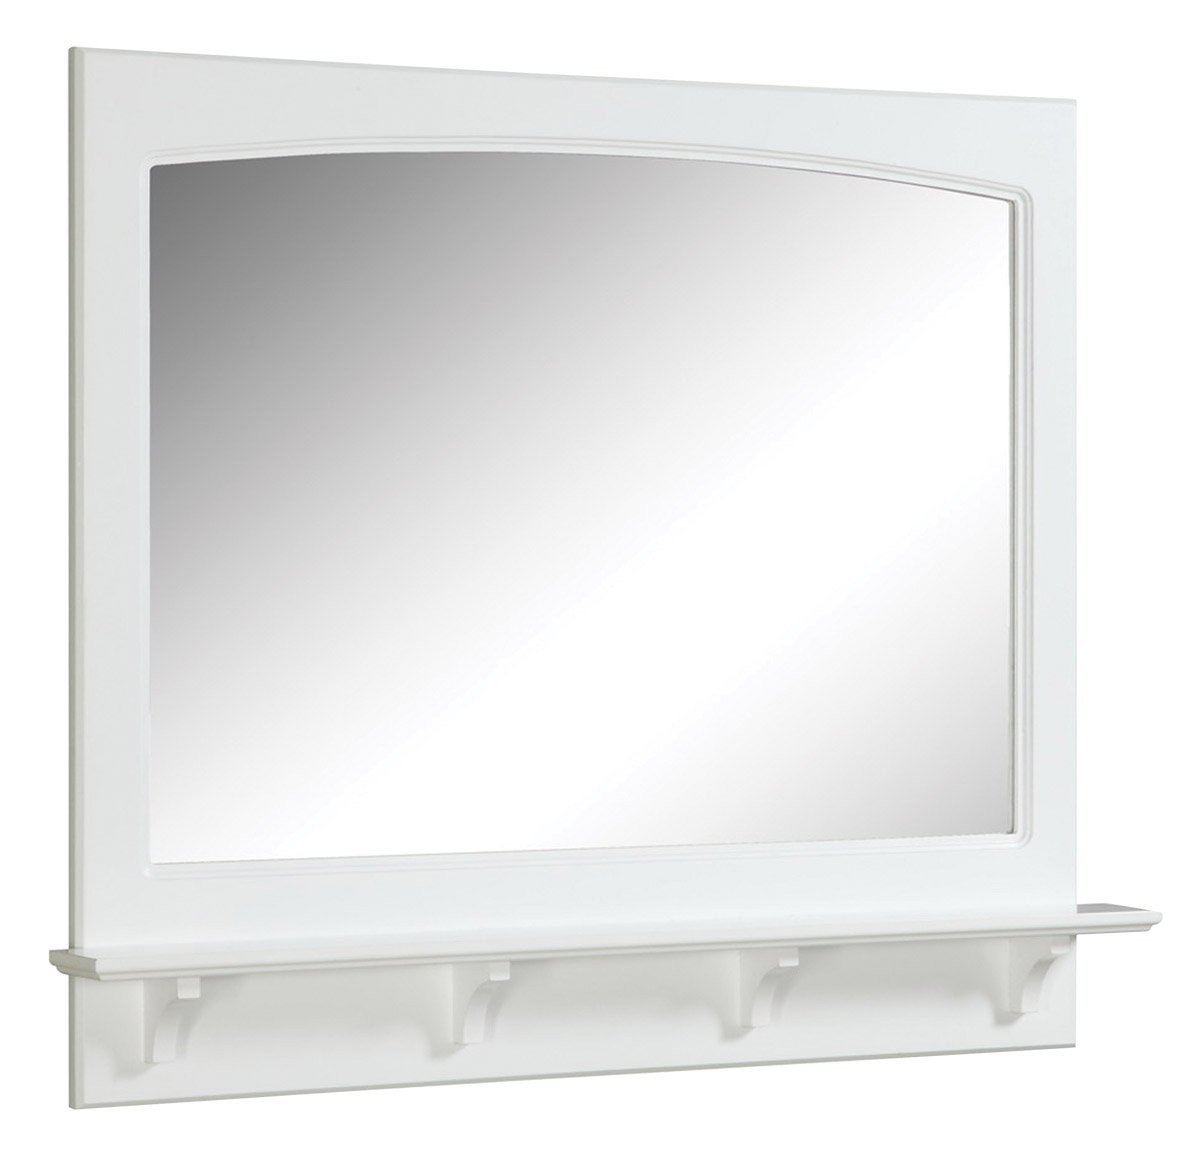 Design House 539940 38x31 Concord Mirror with Shelf, White